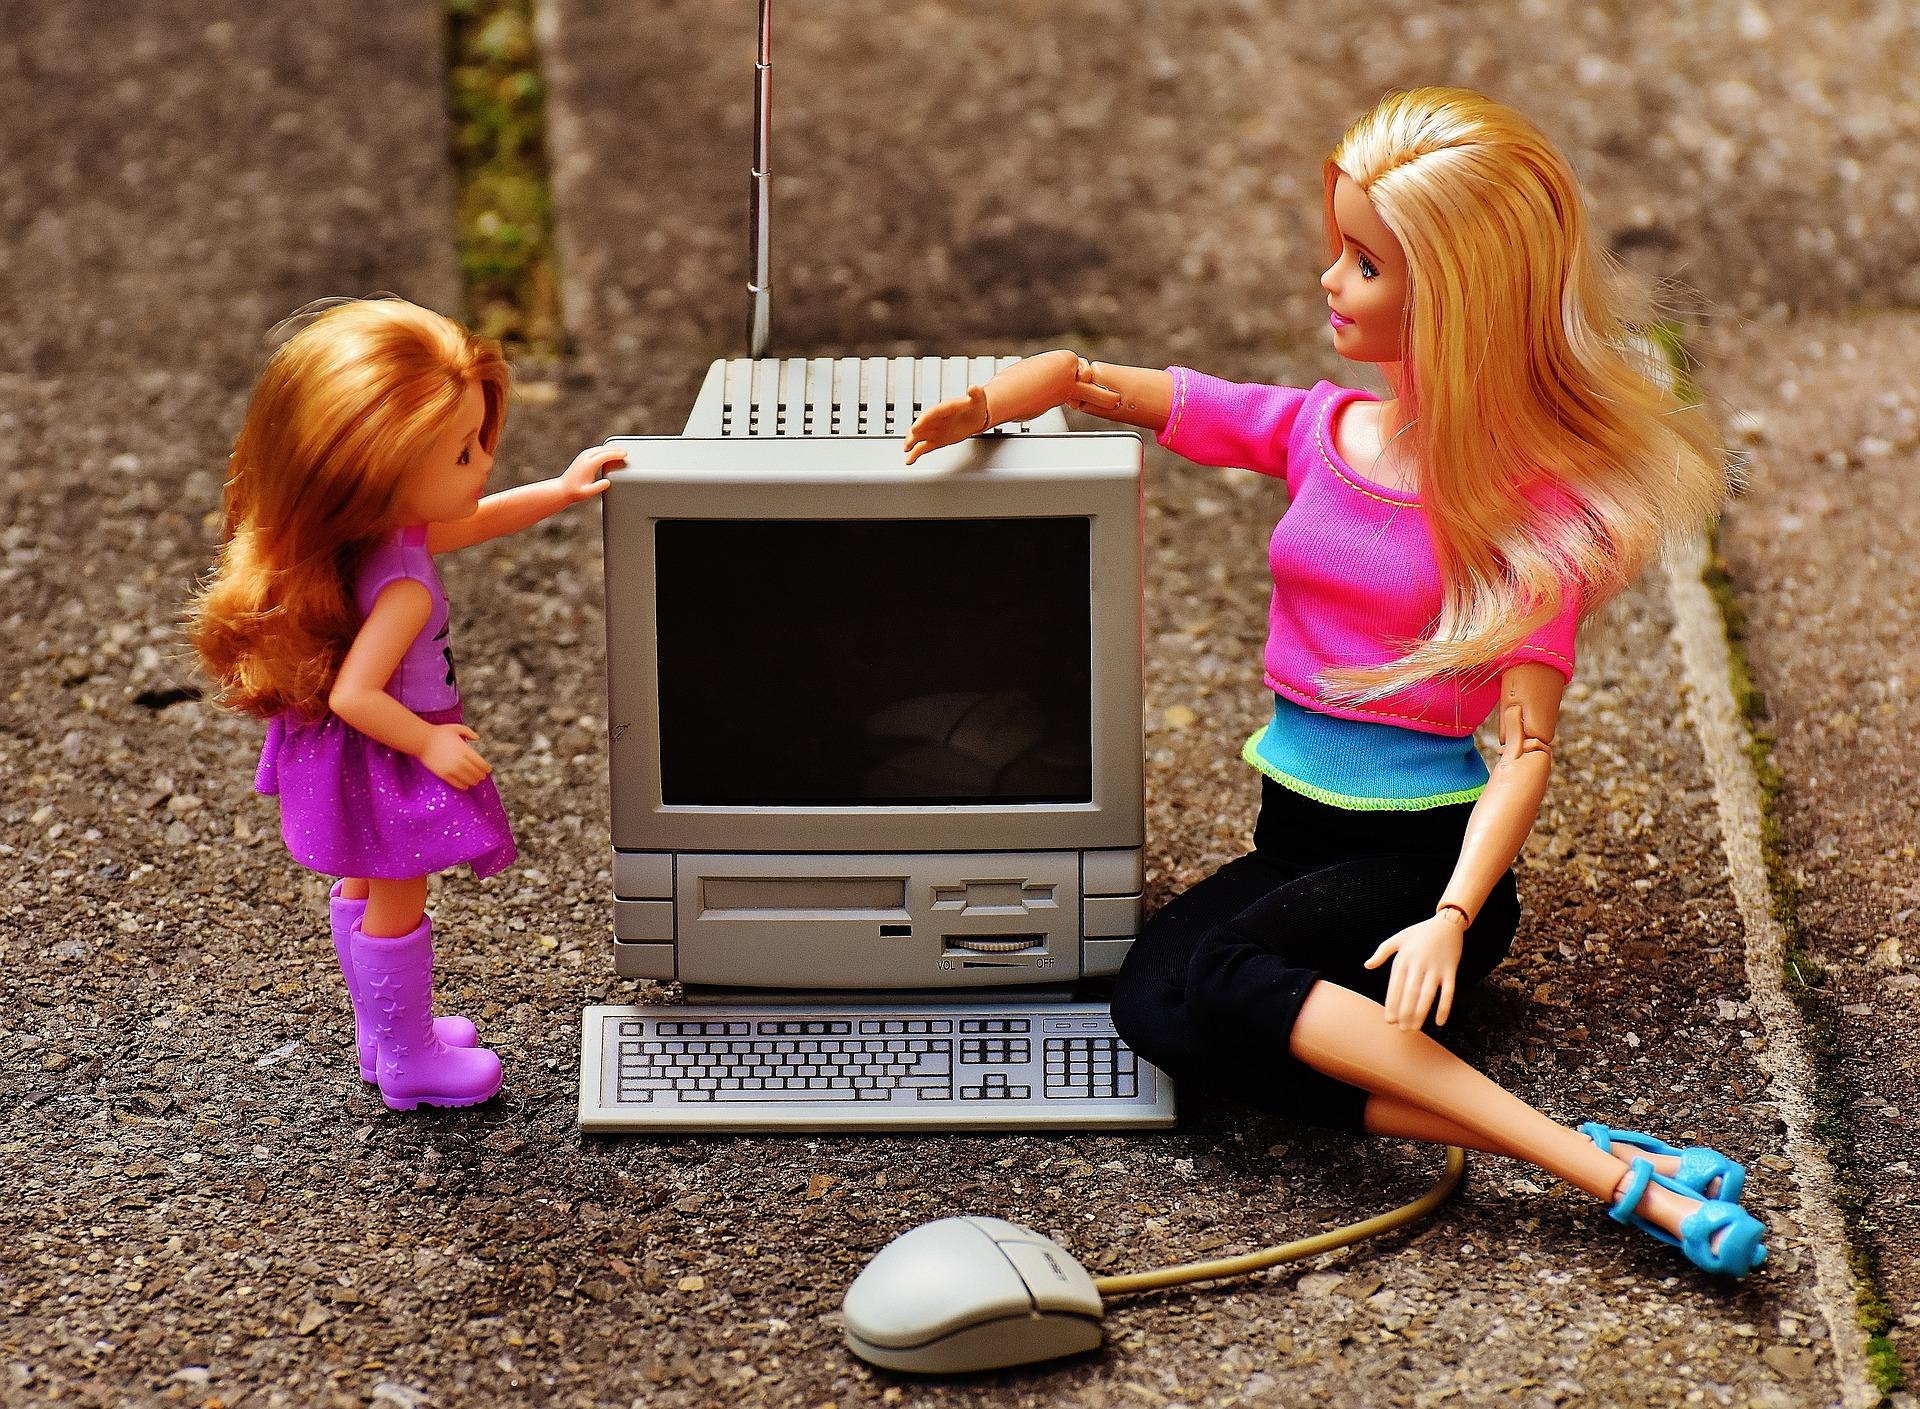 Барби и компьютер